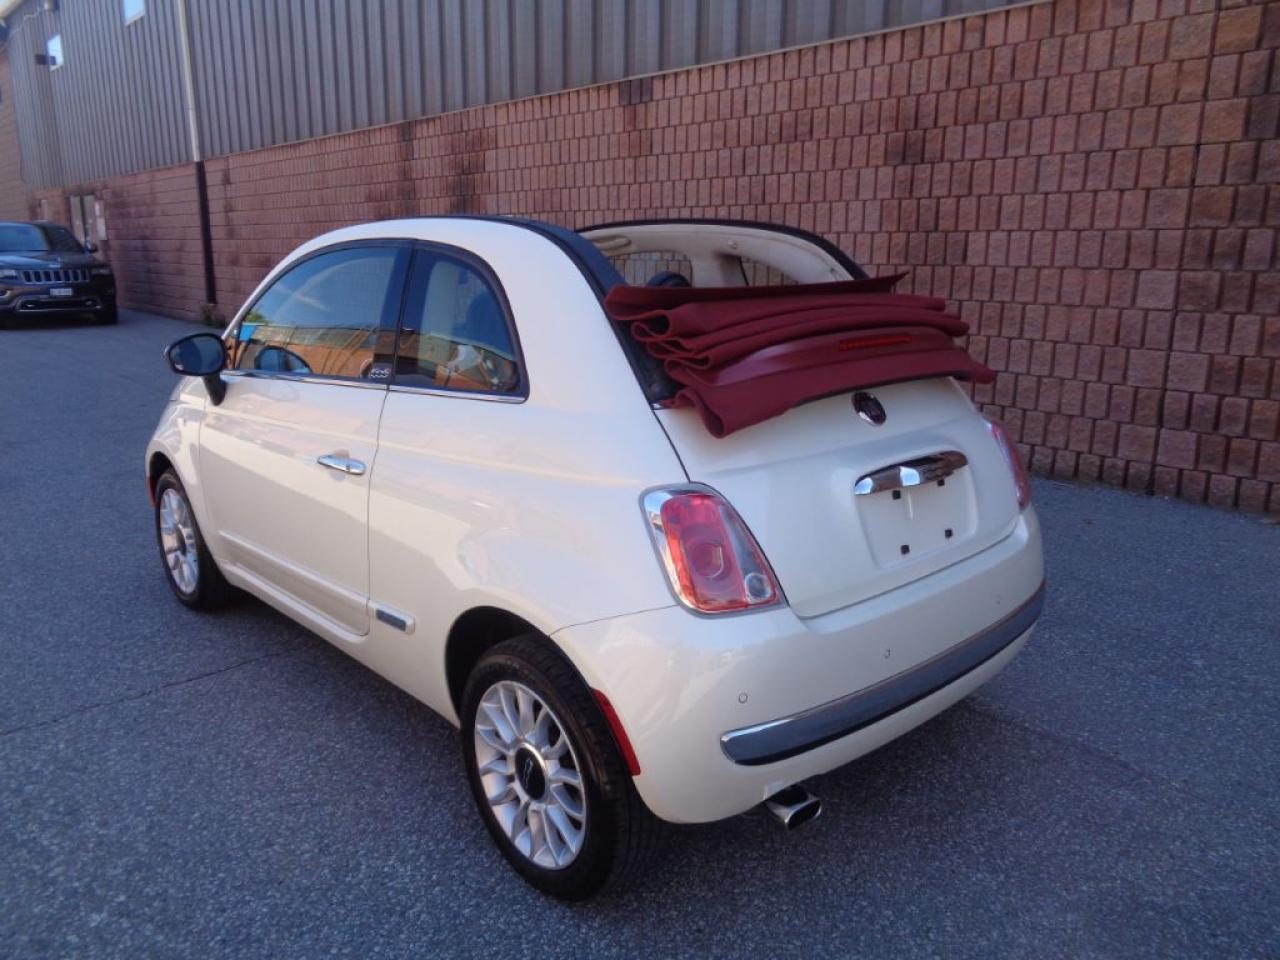 2013 Fiat 500 ***SOLD***